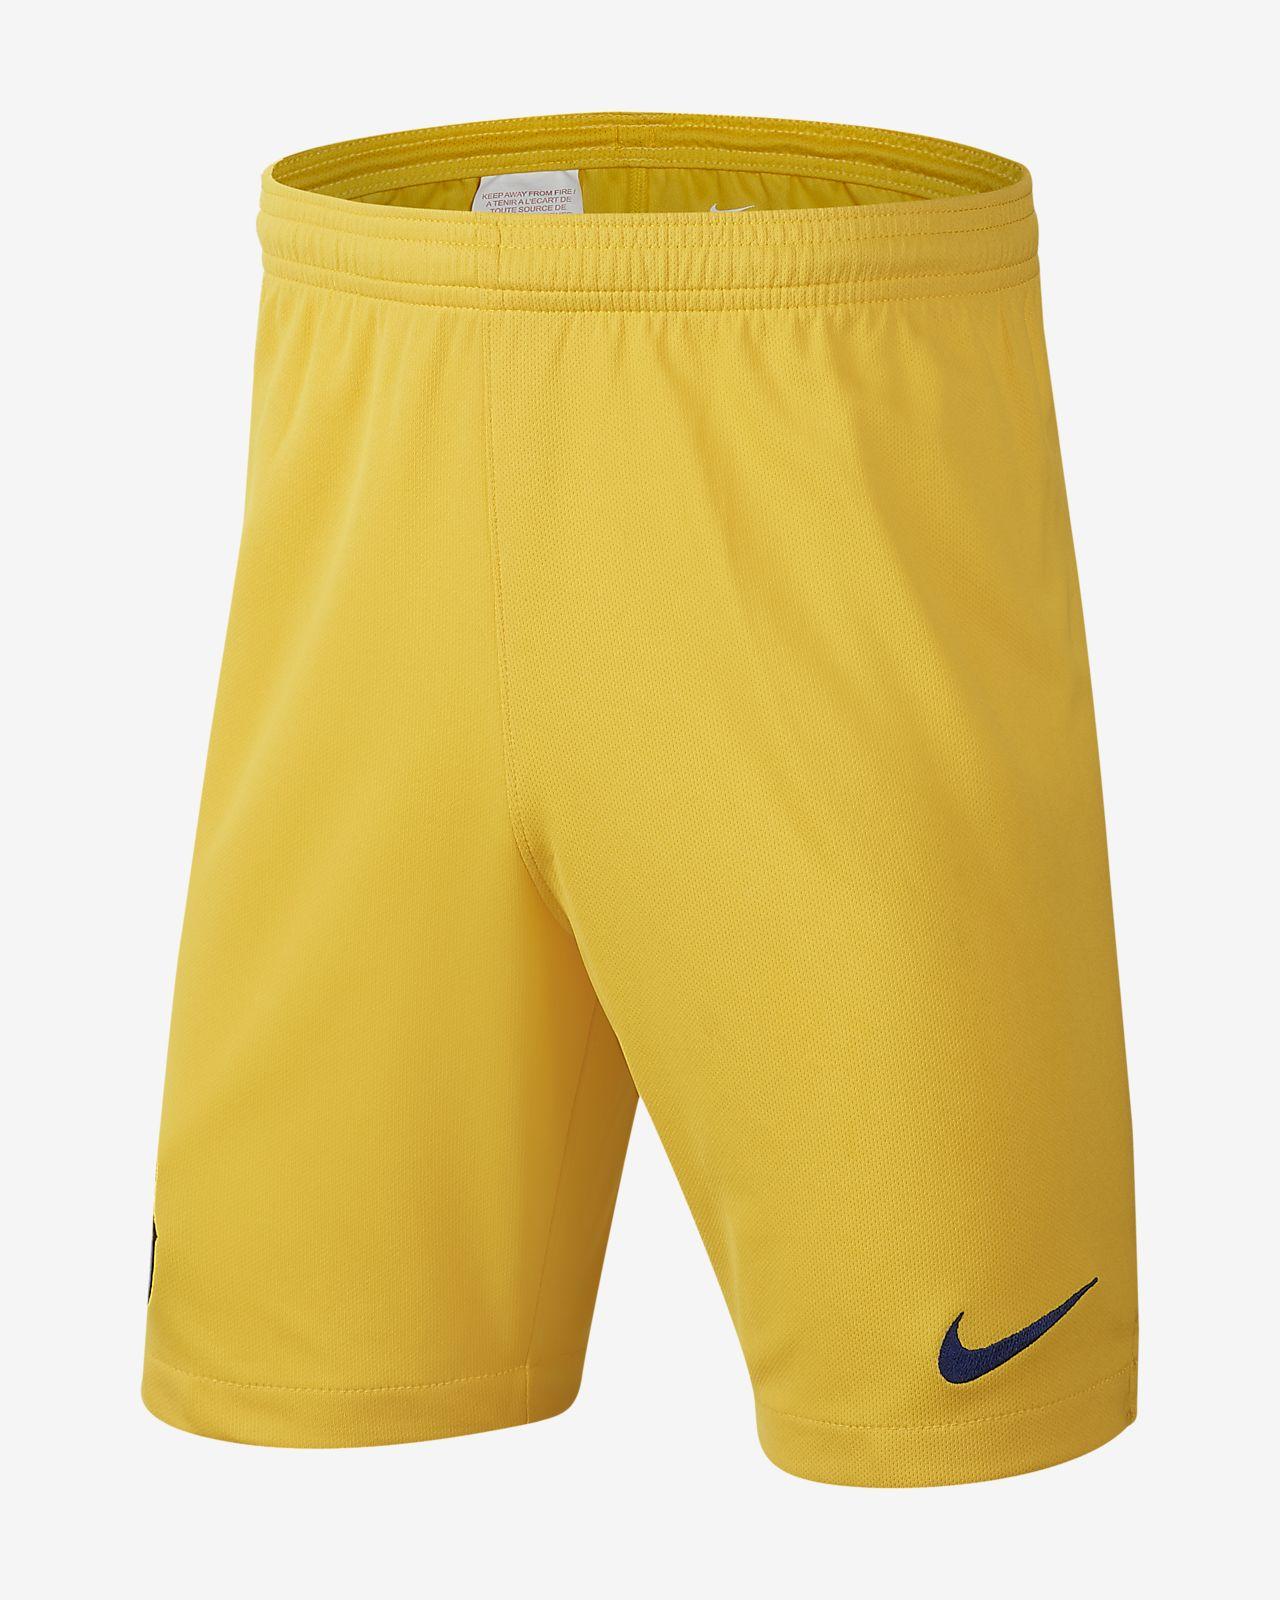 FC Barcelona 2019/20 Stadium Home/Away Pantalons curts de futbol - Nen/a